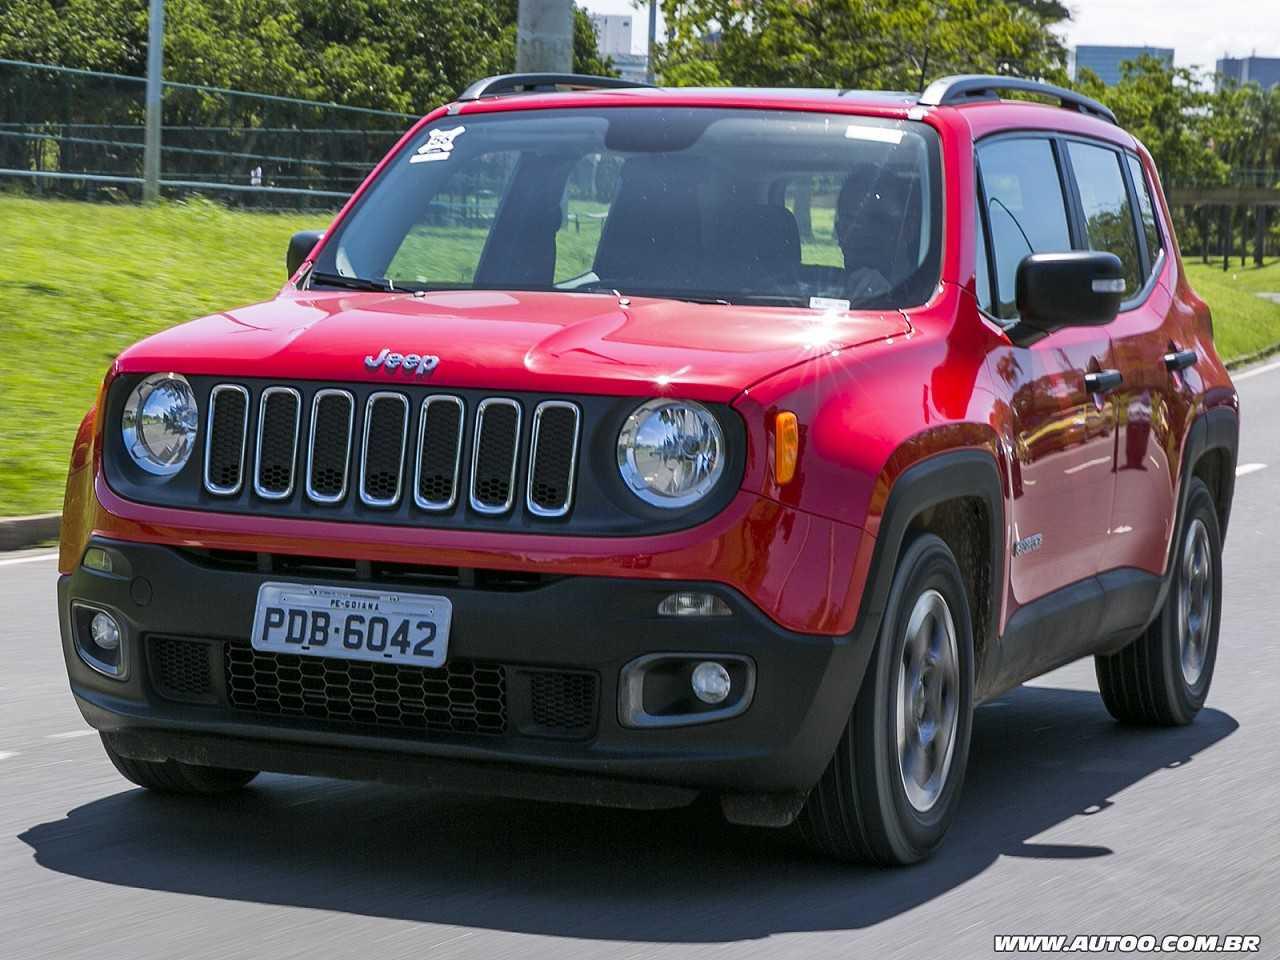 JeepRenegade 2018 - ângulo frontal